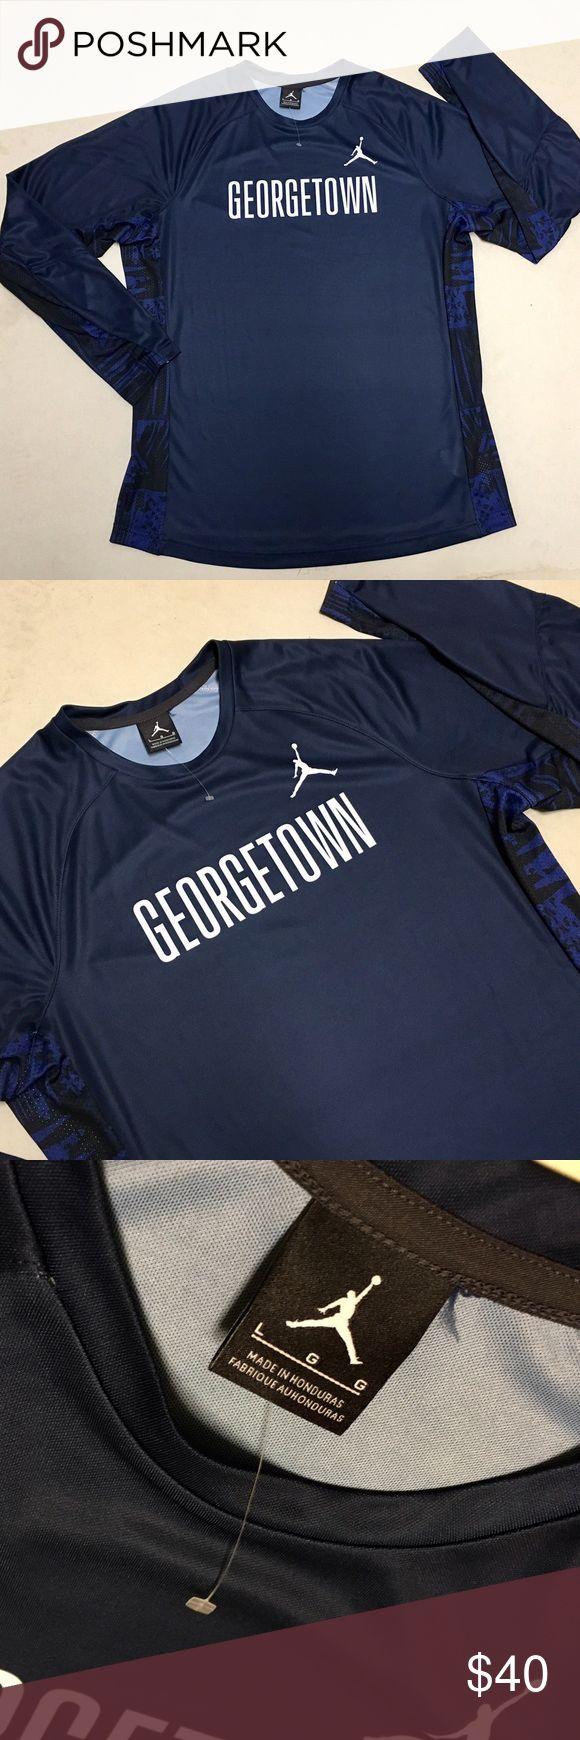 Georgetown - Jordan Men's Athletic Shirt Georgetown University Jordan Athletic Performance Long Sleeve  Banded sleeves Mesh print sides  100% Polyester   Size Men's Large   New without tags!!  💯 Jordan Shirts Tees - Long Sleeve